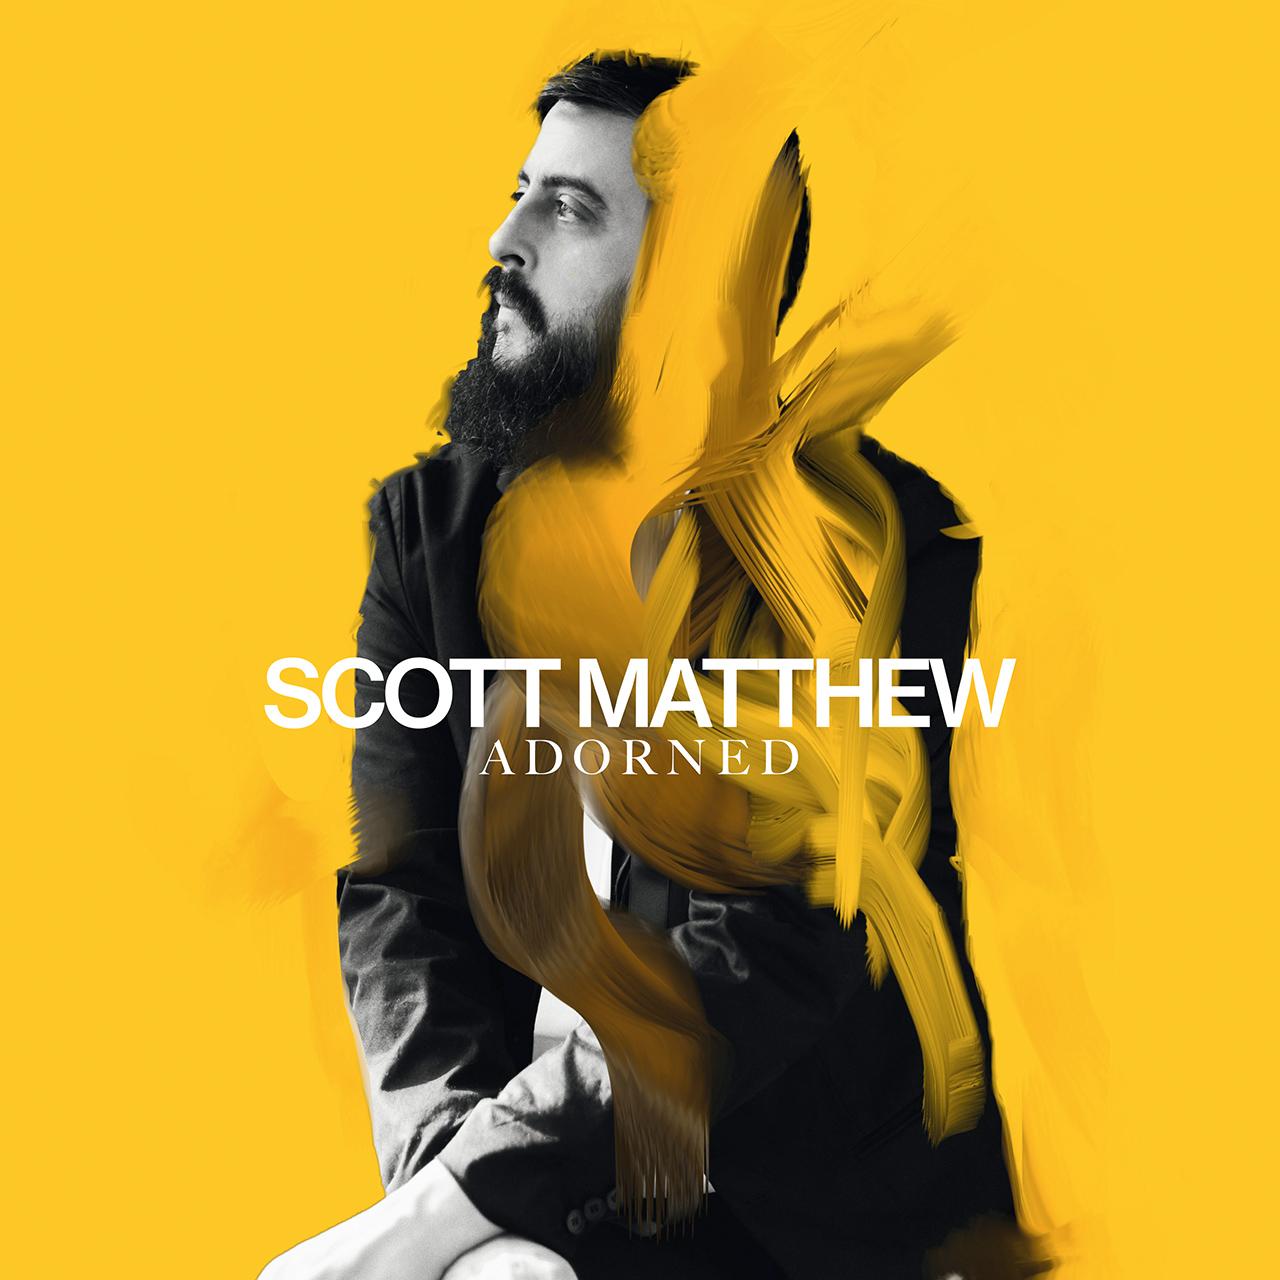 Adorned Scott Matthew